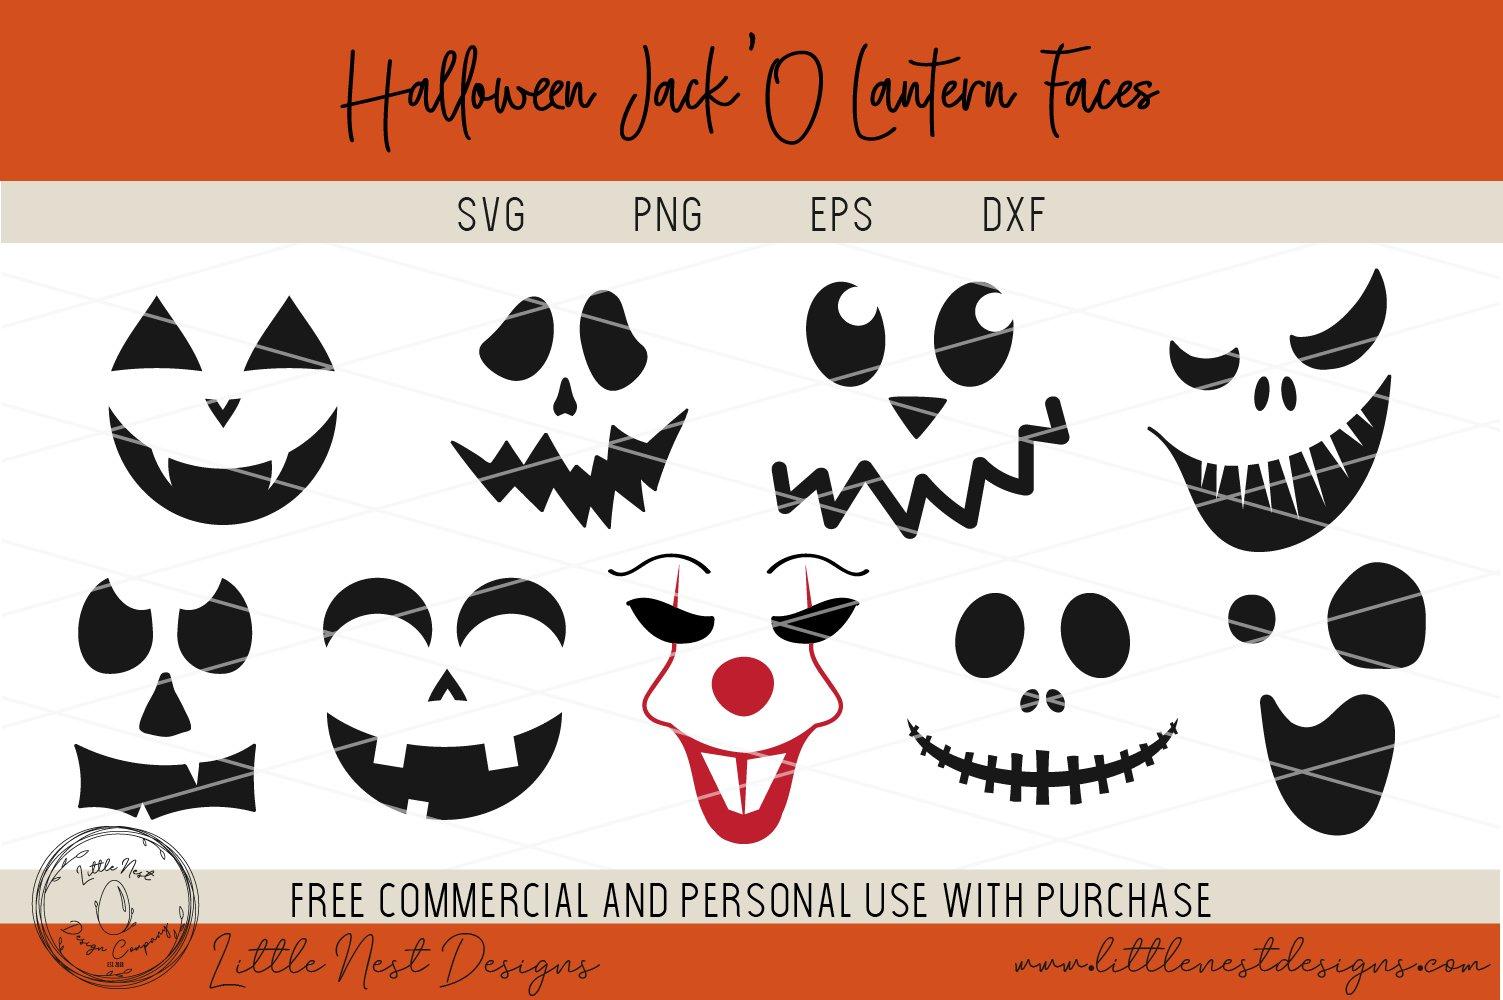 Halloween Jack O Lantern Faces Pumpkin Faces Svg Pumpkin 350159 Svgs Design Bundles